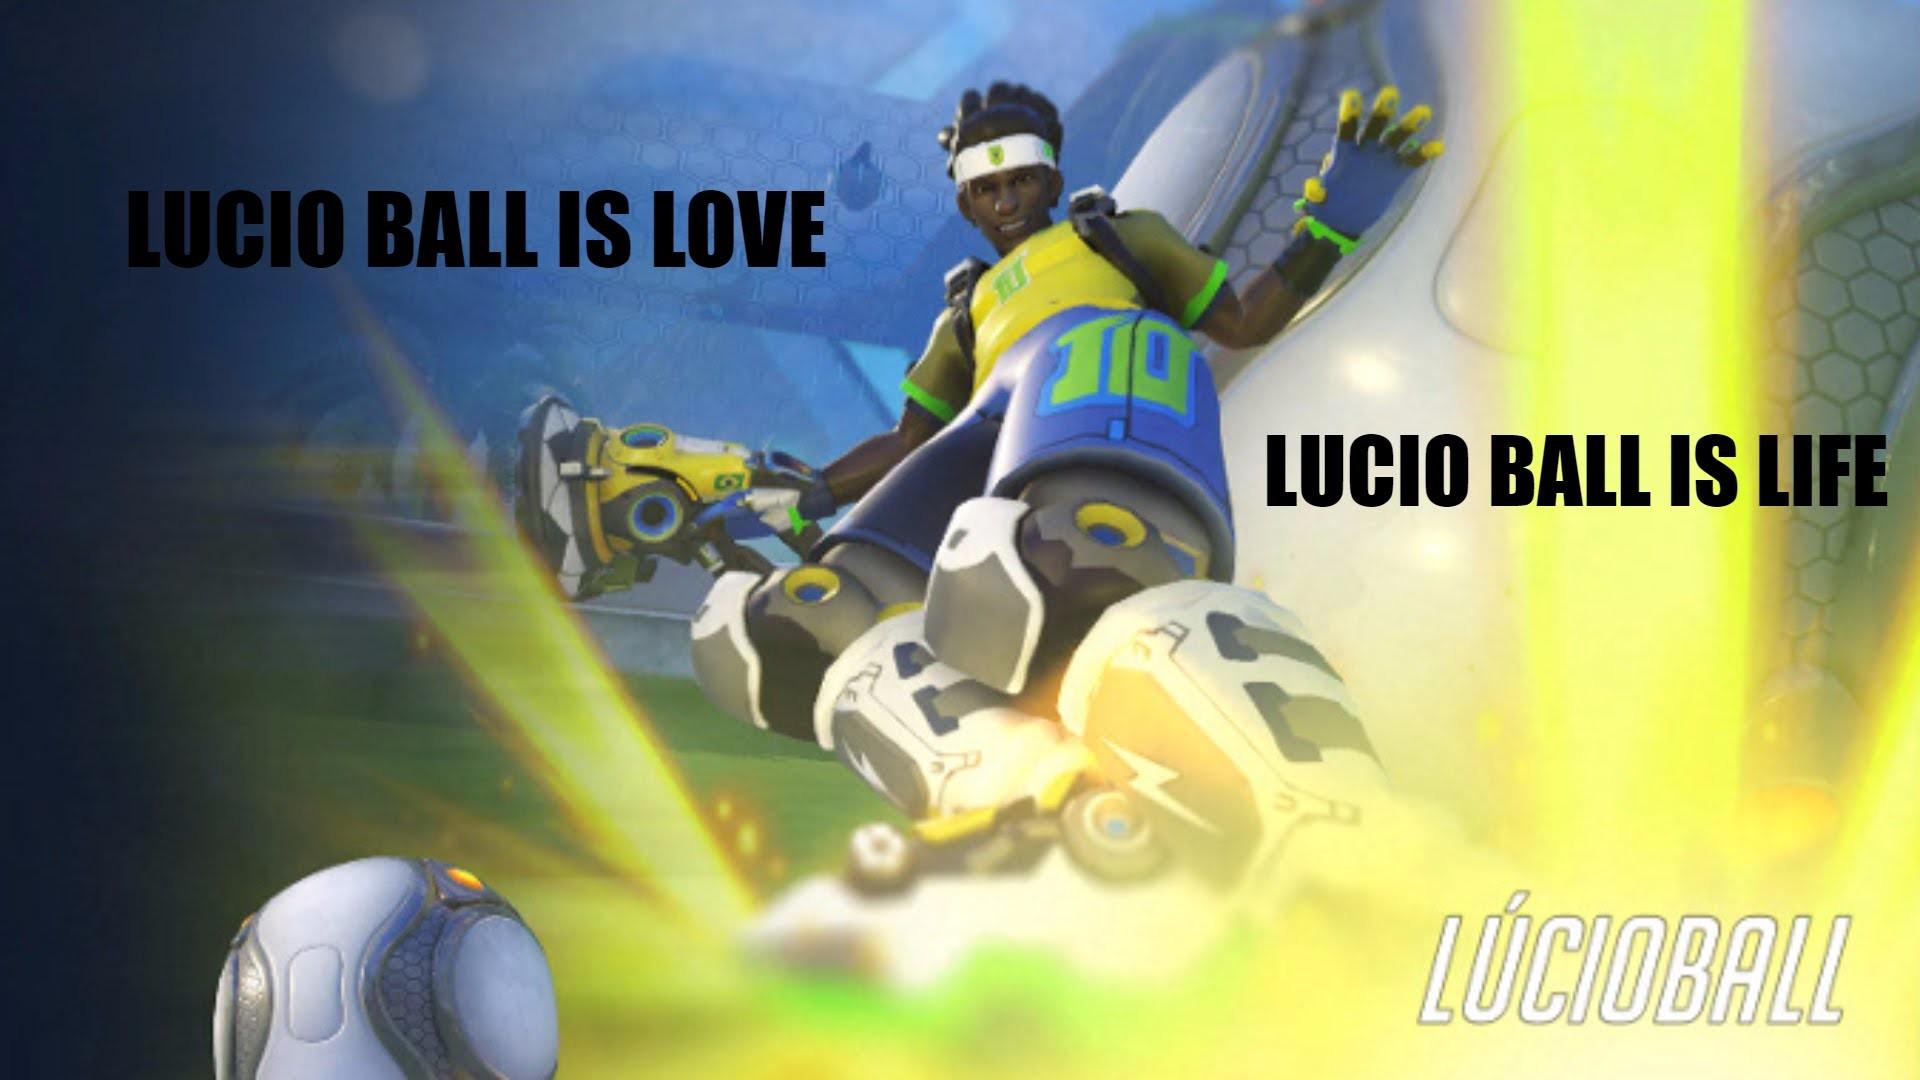 LUCIO BALL IS LOVE, LUCIO BALL IS LIFE